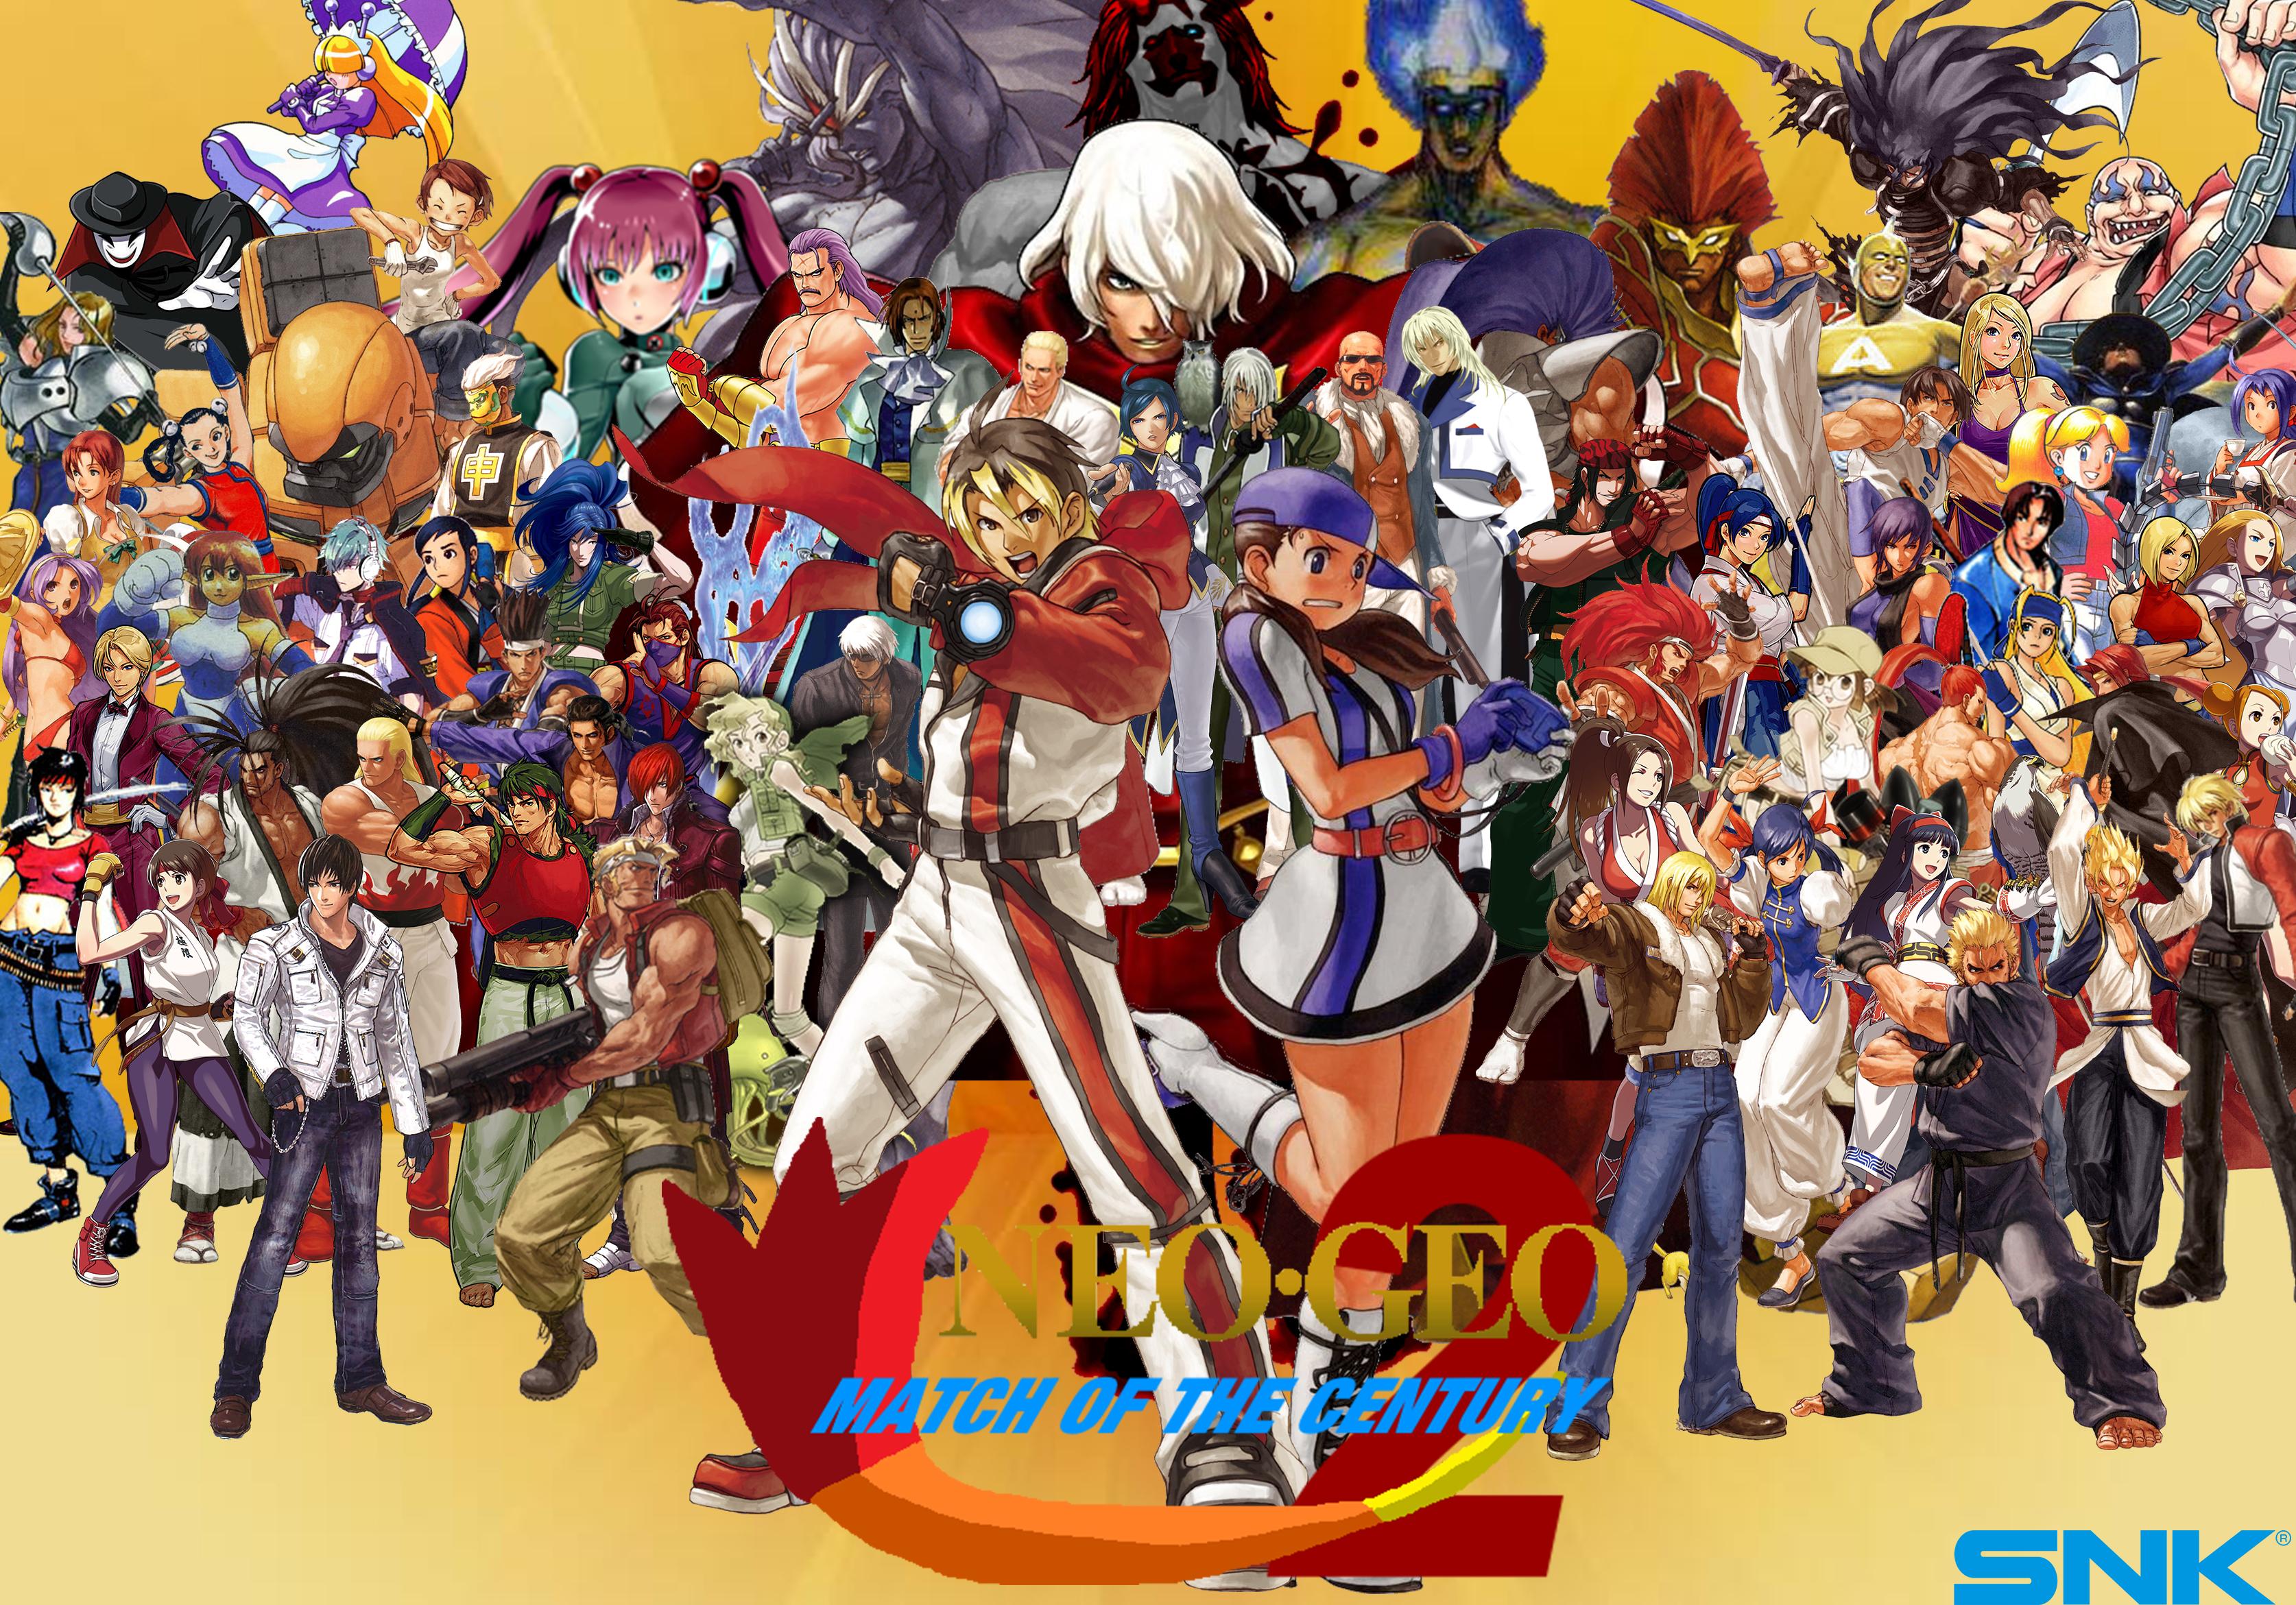 Neo Geo 2: Match of the Century